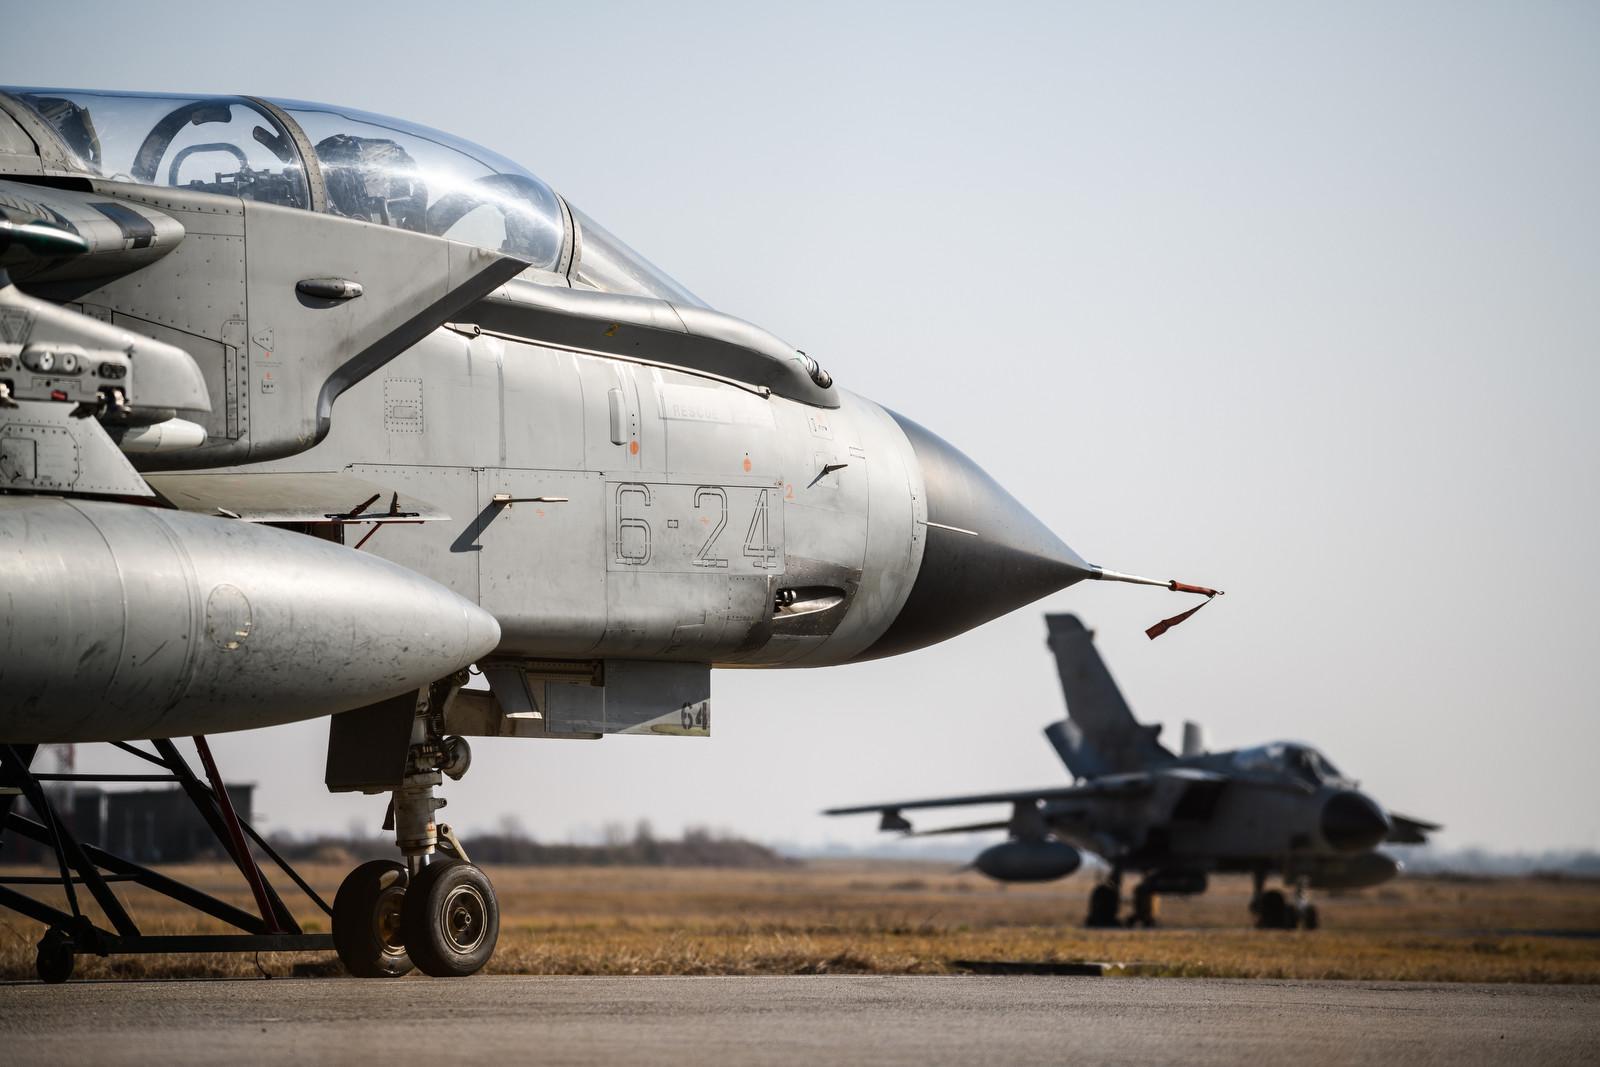 Tornado - 6° Stormo Ghedi - Aeronautica Militare